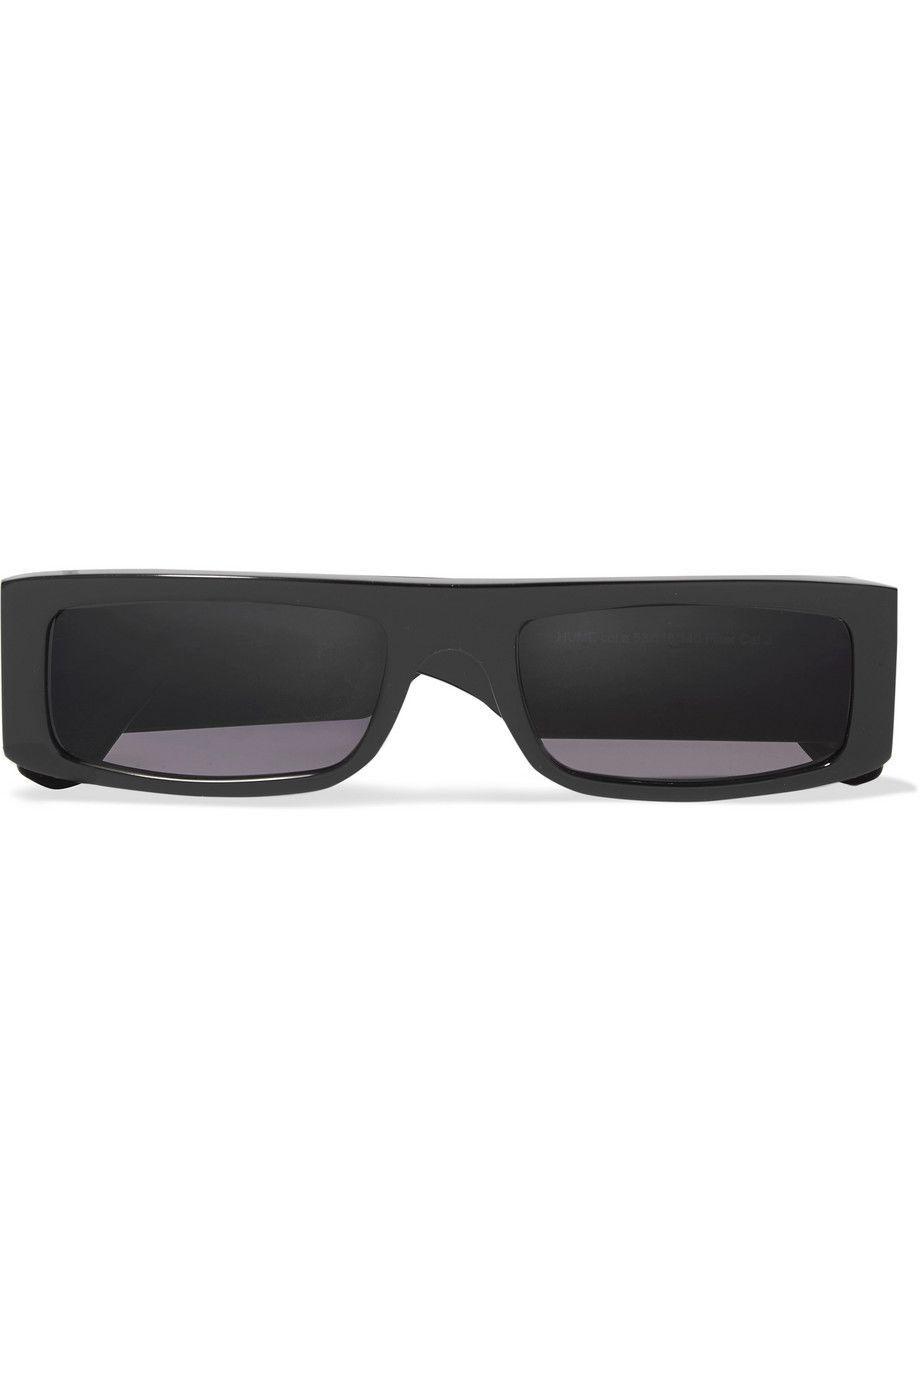 #PopbelaOOTD: Kacamata Hitam Model Kotak yang Trending